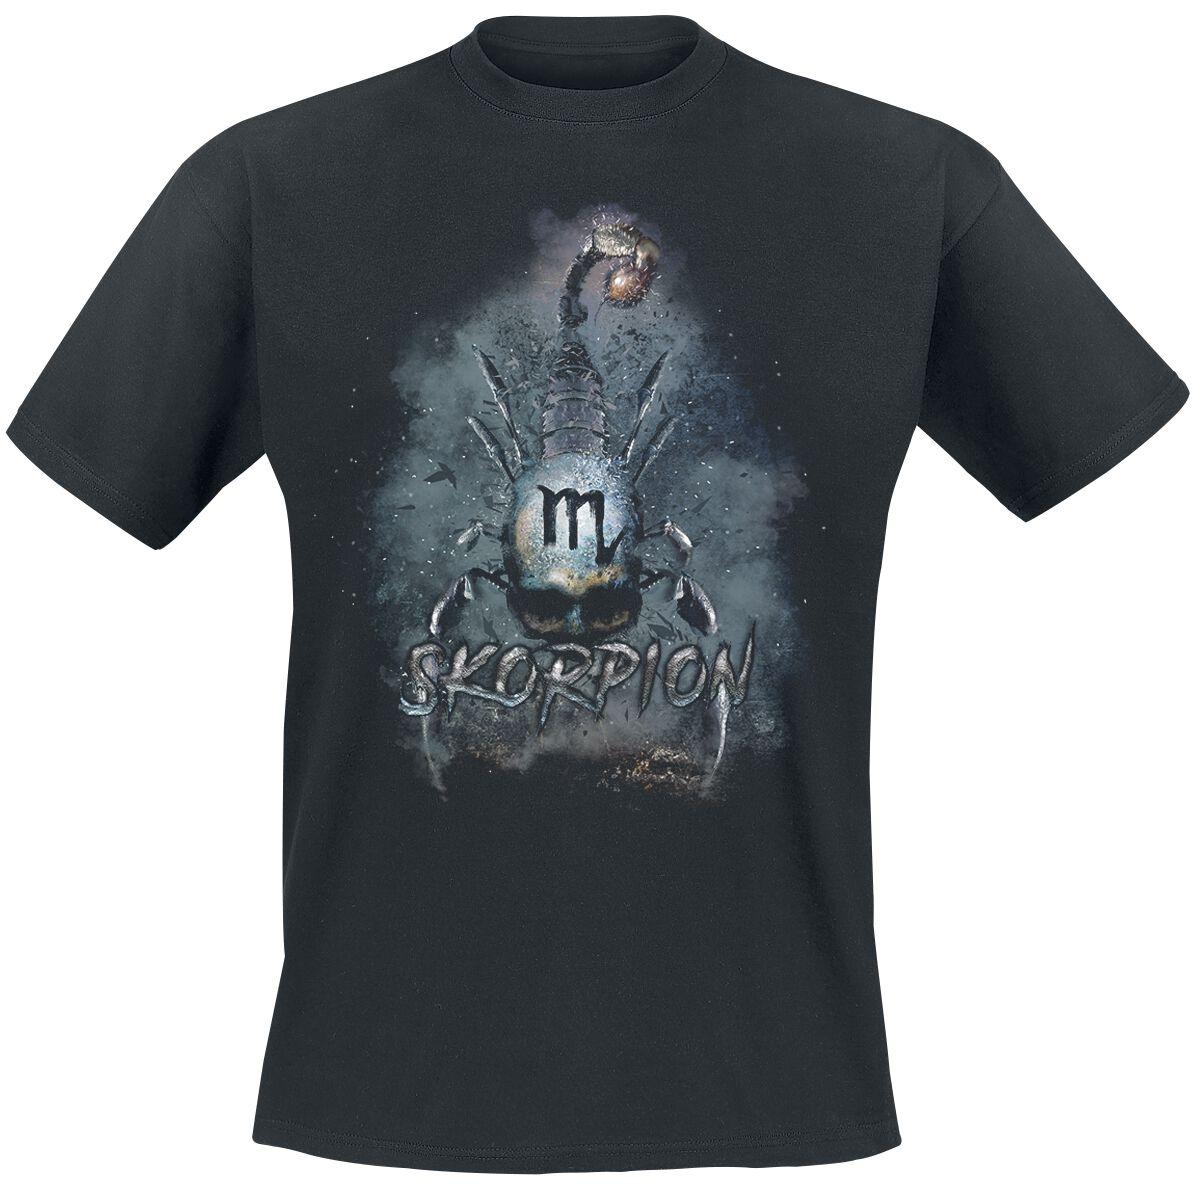 Motyw - Koszulki - T-Shirt Scorpio T-Shirt czarny - 366752